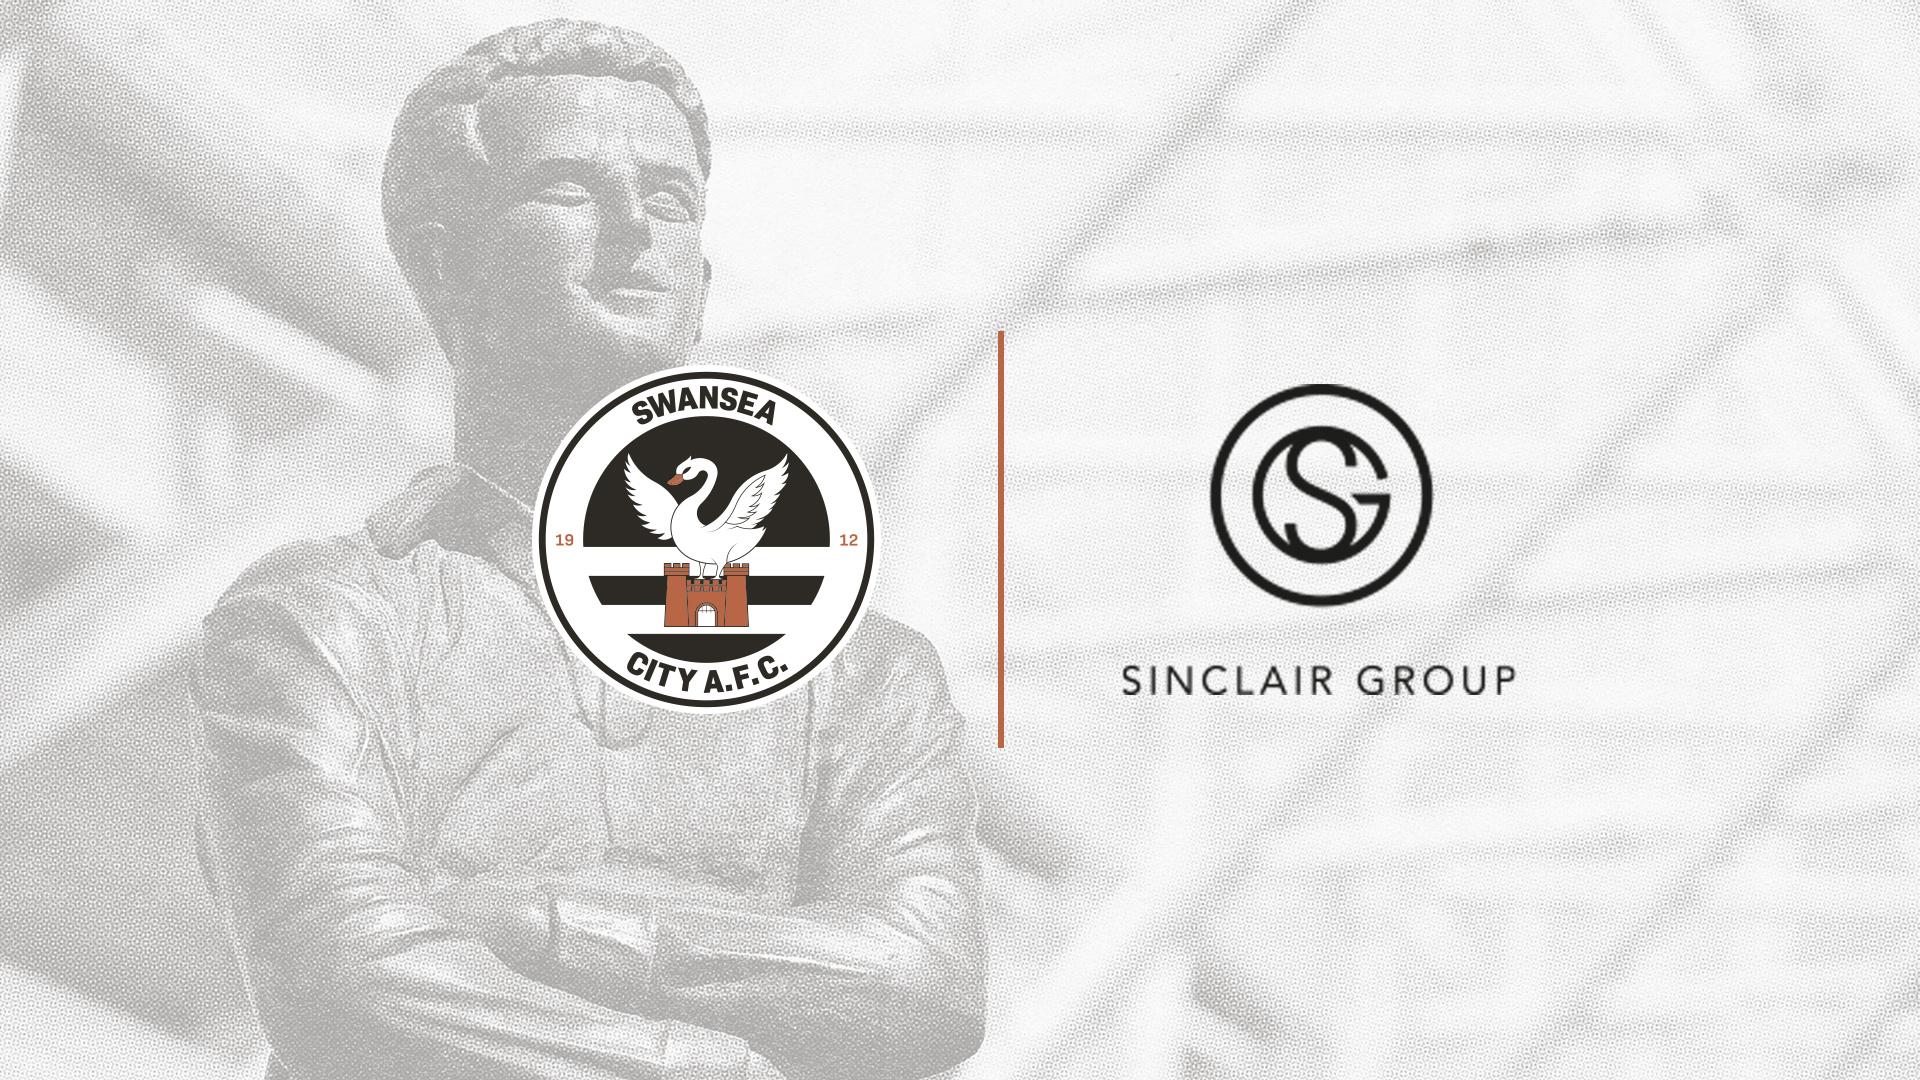 Swans x Sinclair Swansea